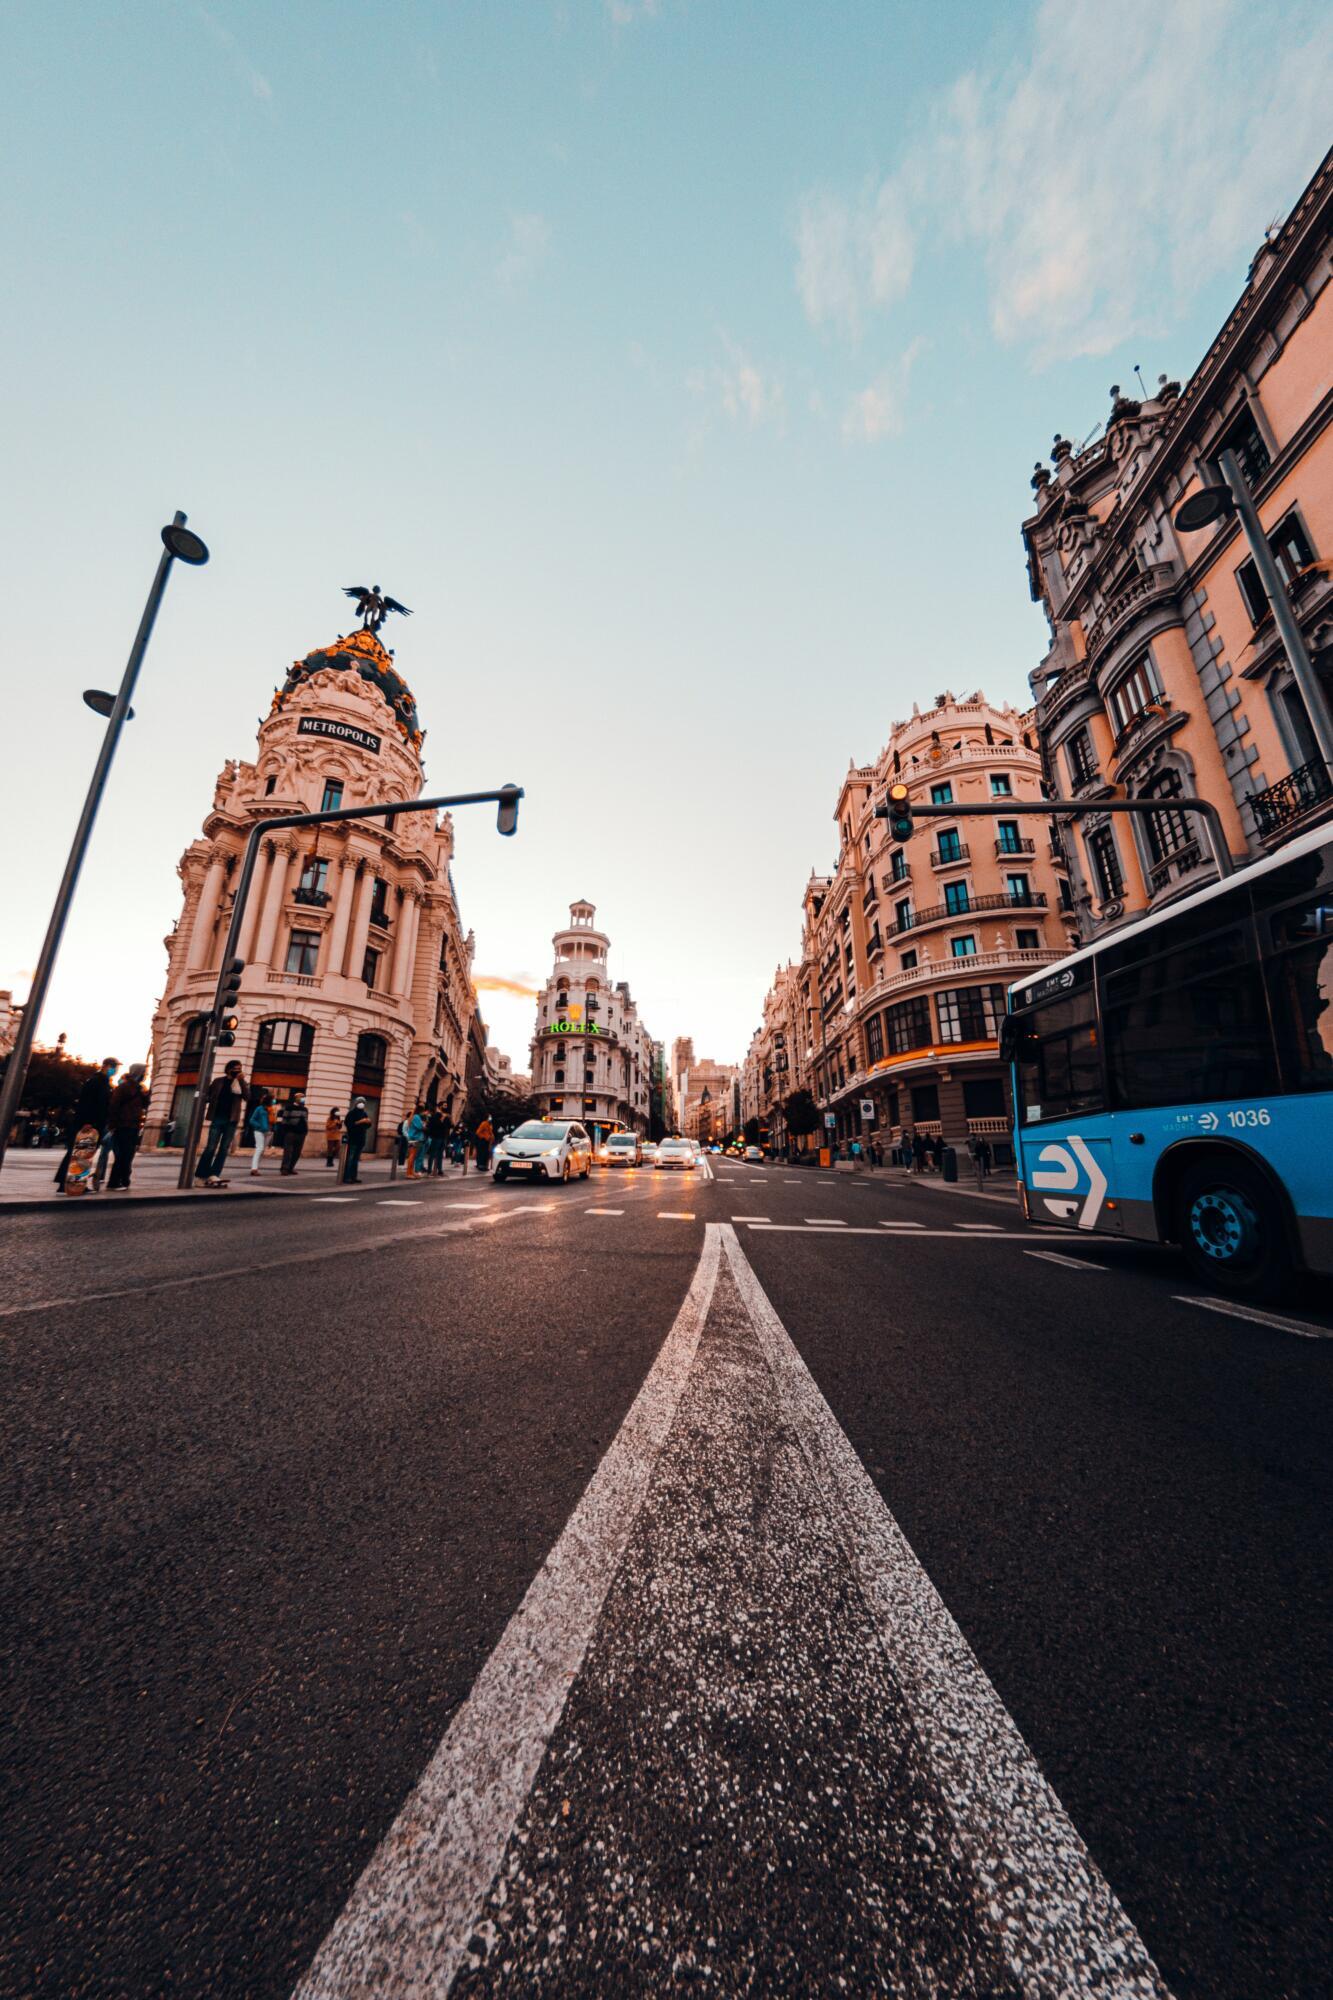 Madrid to make public transport free during morning peak hours